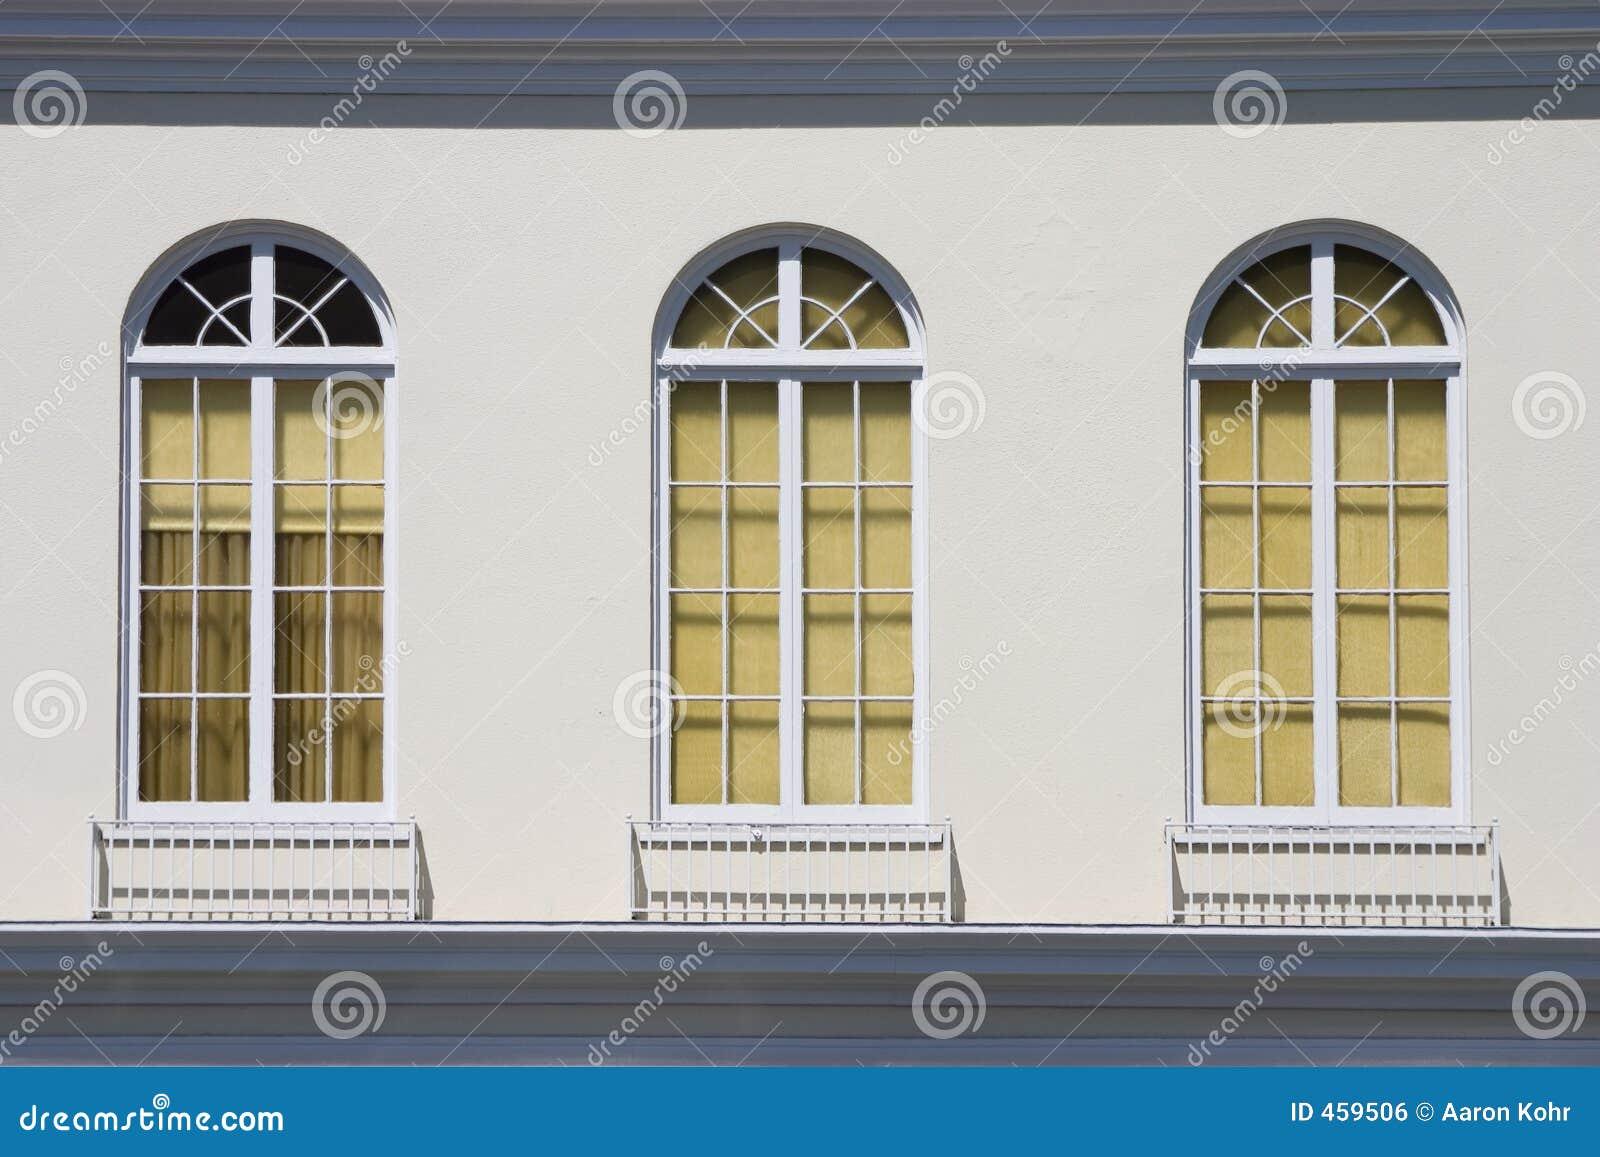 Old Fashioned Windows Royalty Free Stock Image Image 459506